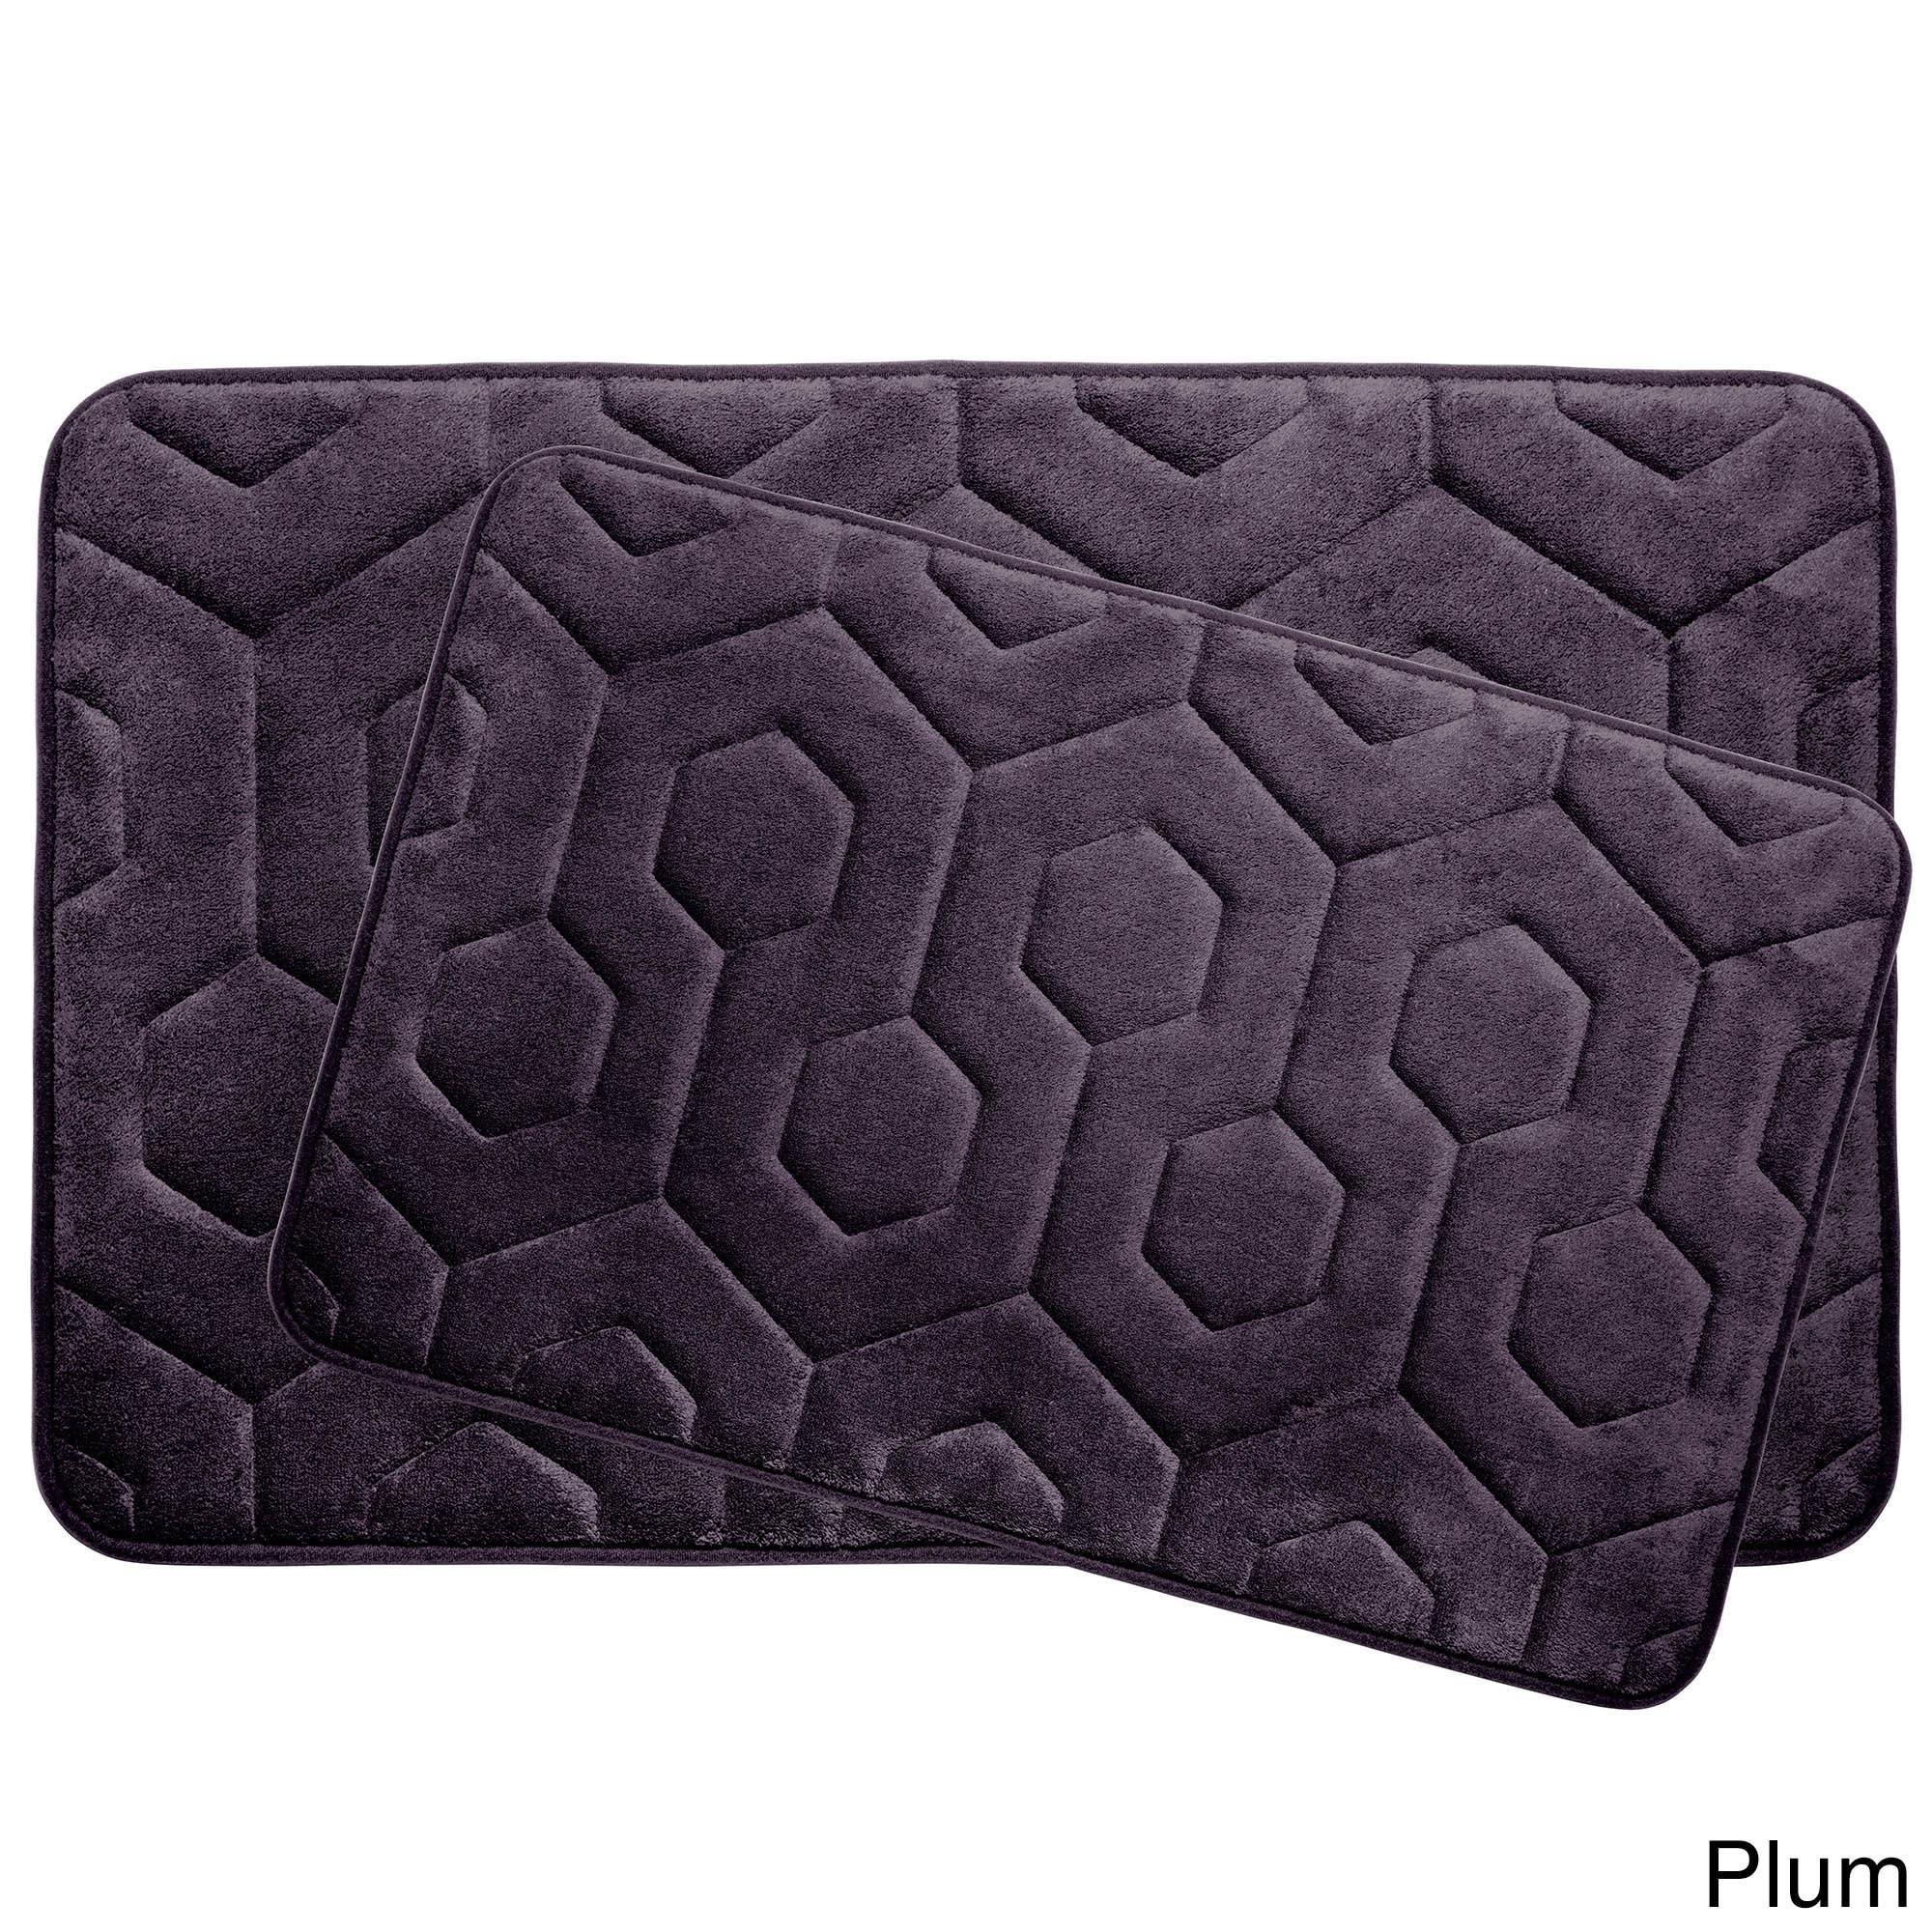 pin purple mat best to choose towels and bath mats towel the how dorm